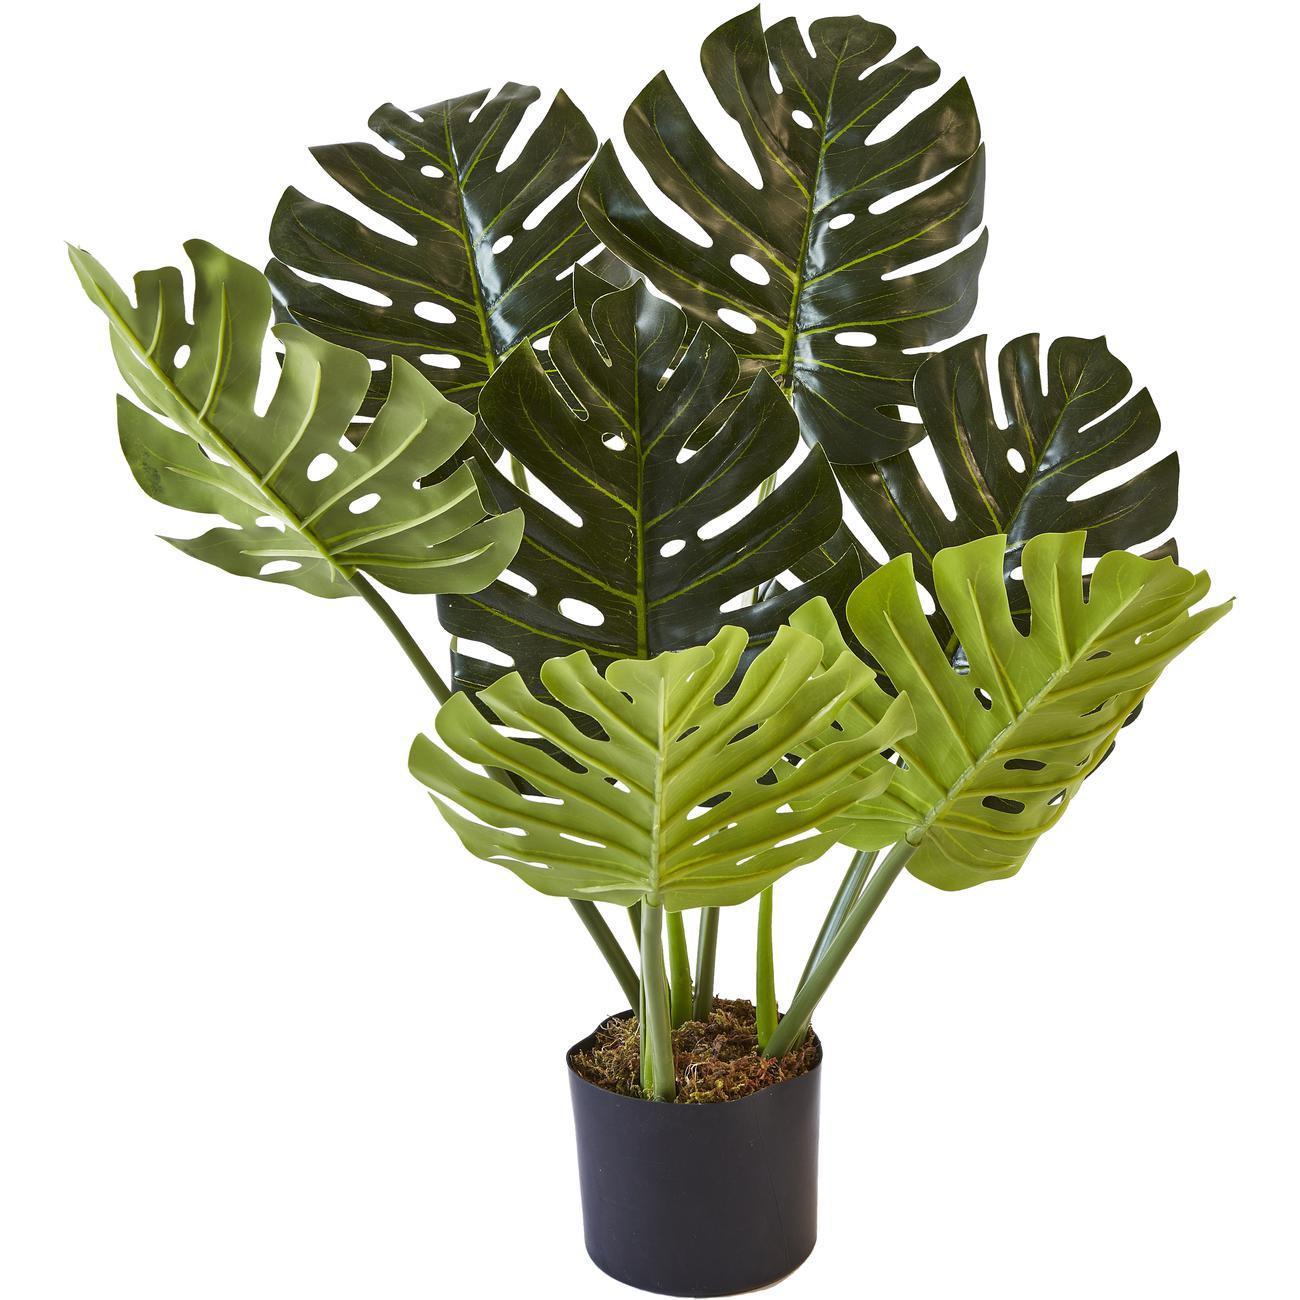 Plante artificielle OLLA 7 feuilles